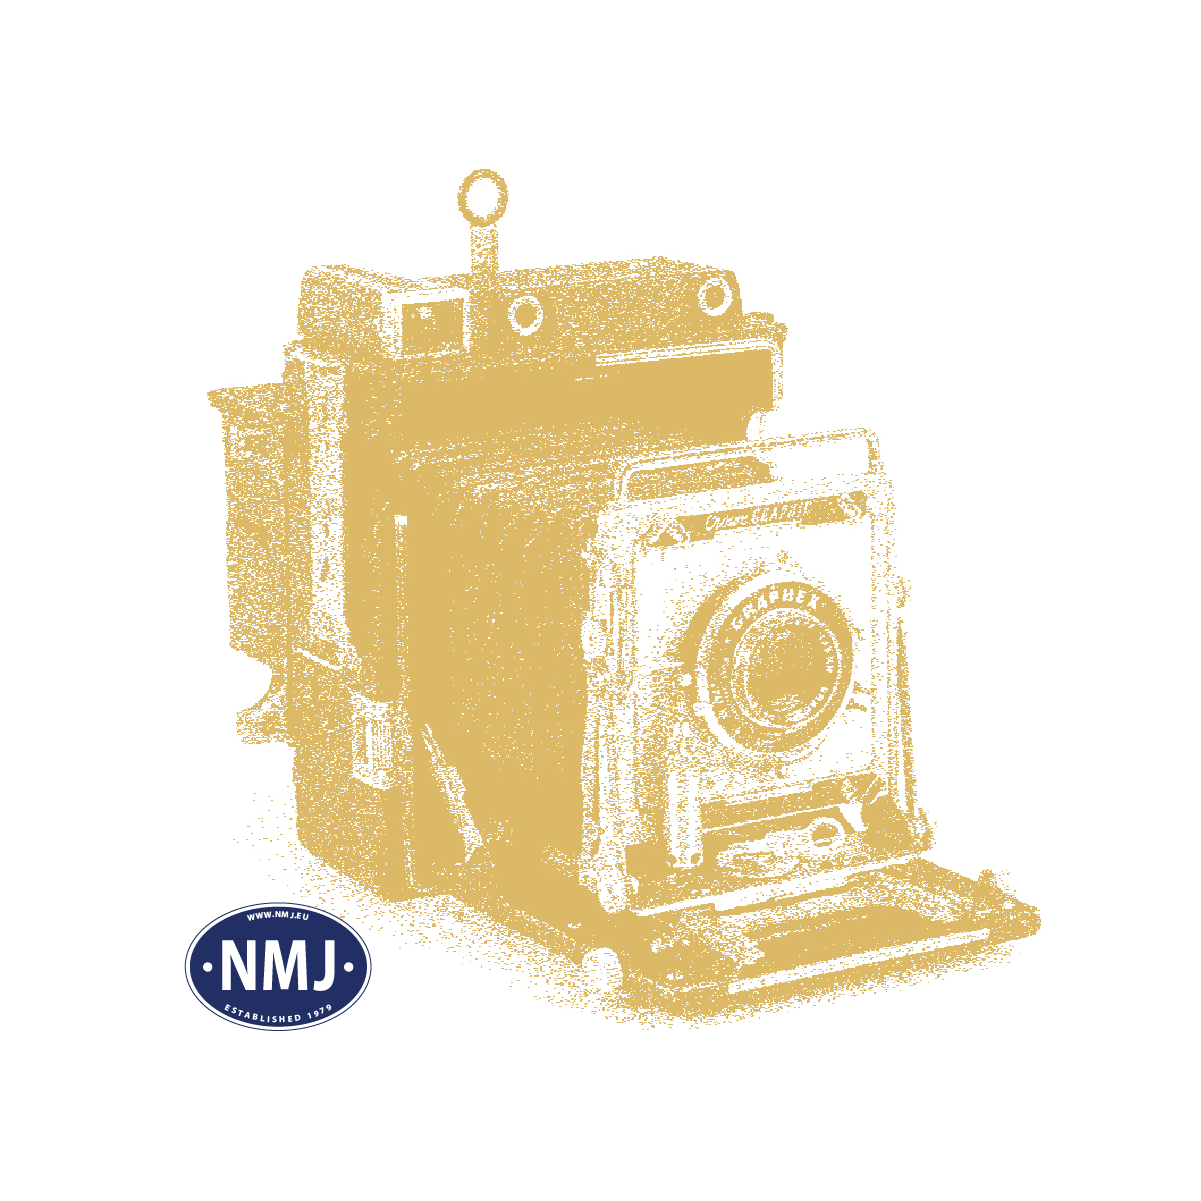 VIE4416 - Utkjørssignal m/ Forsignal, N-Skala